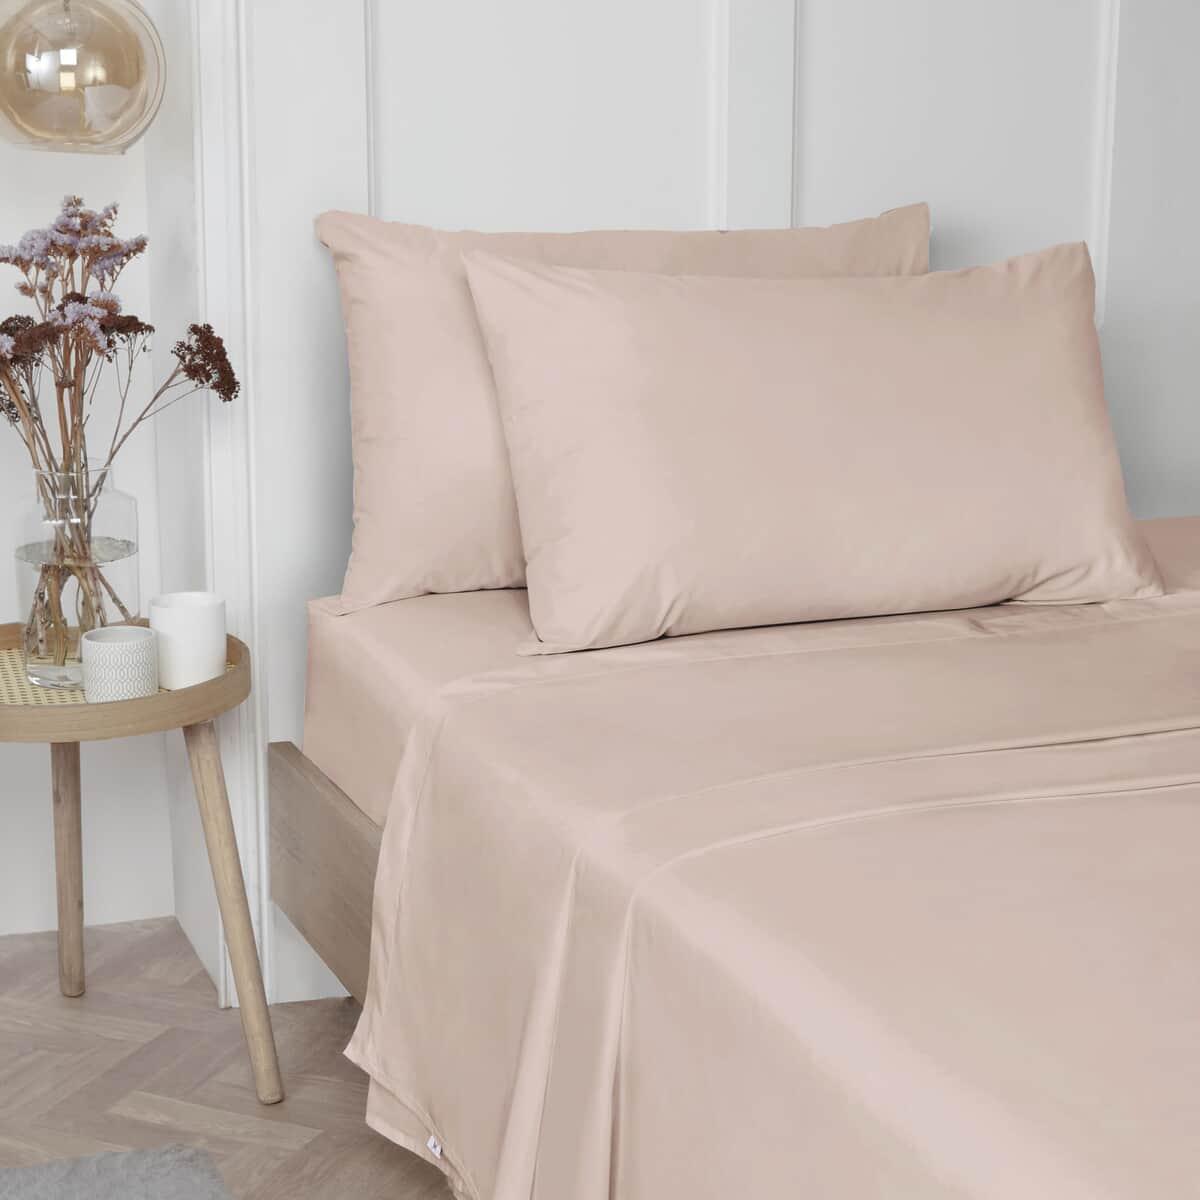 Vantona Plain Dye Pink large